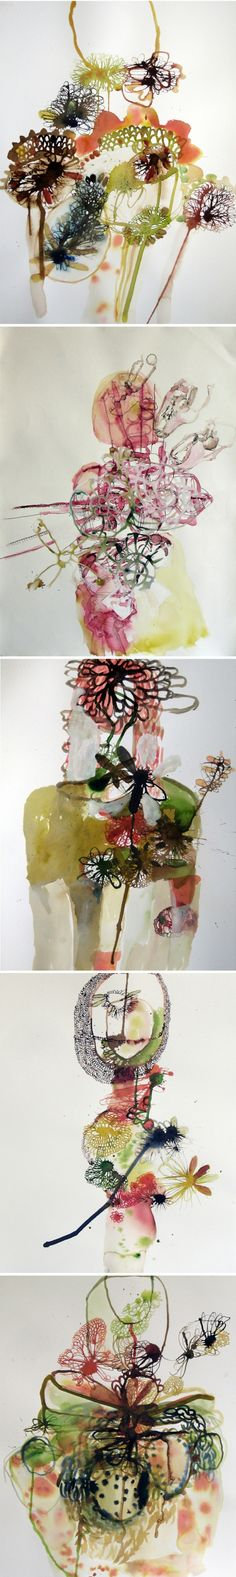 Beautiful abstract watercolour flowers by Elizabeth Terhune via Jealous Curator